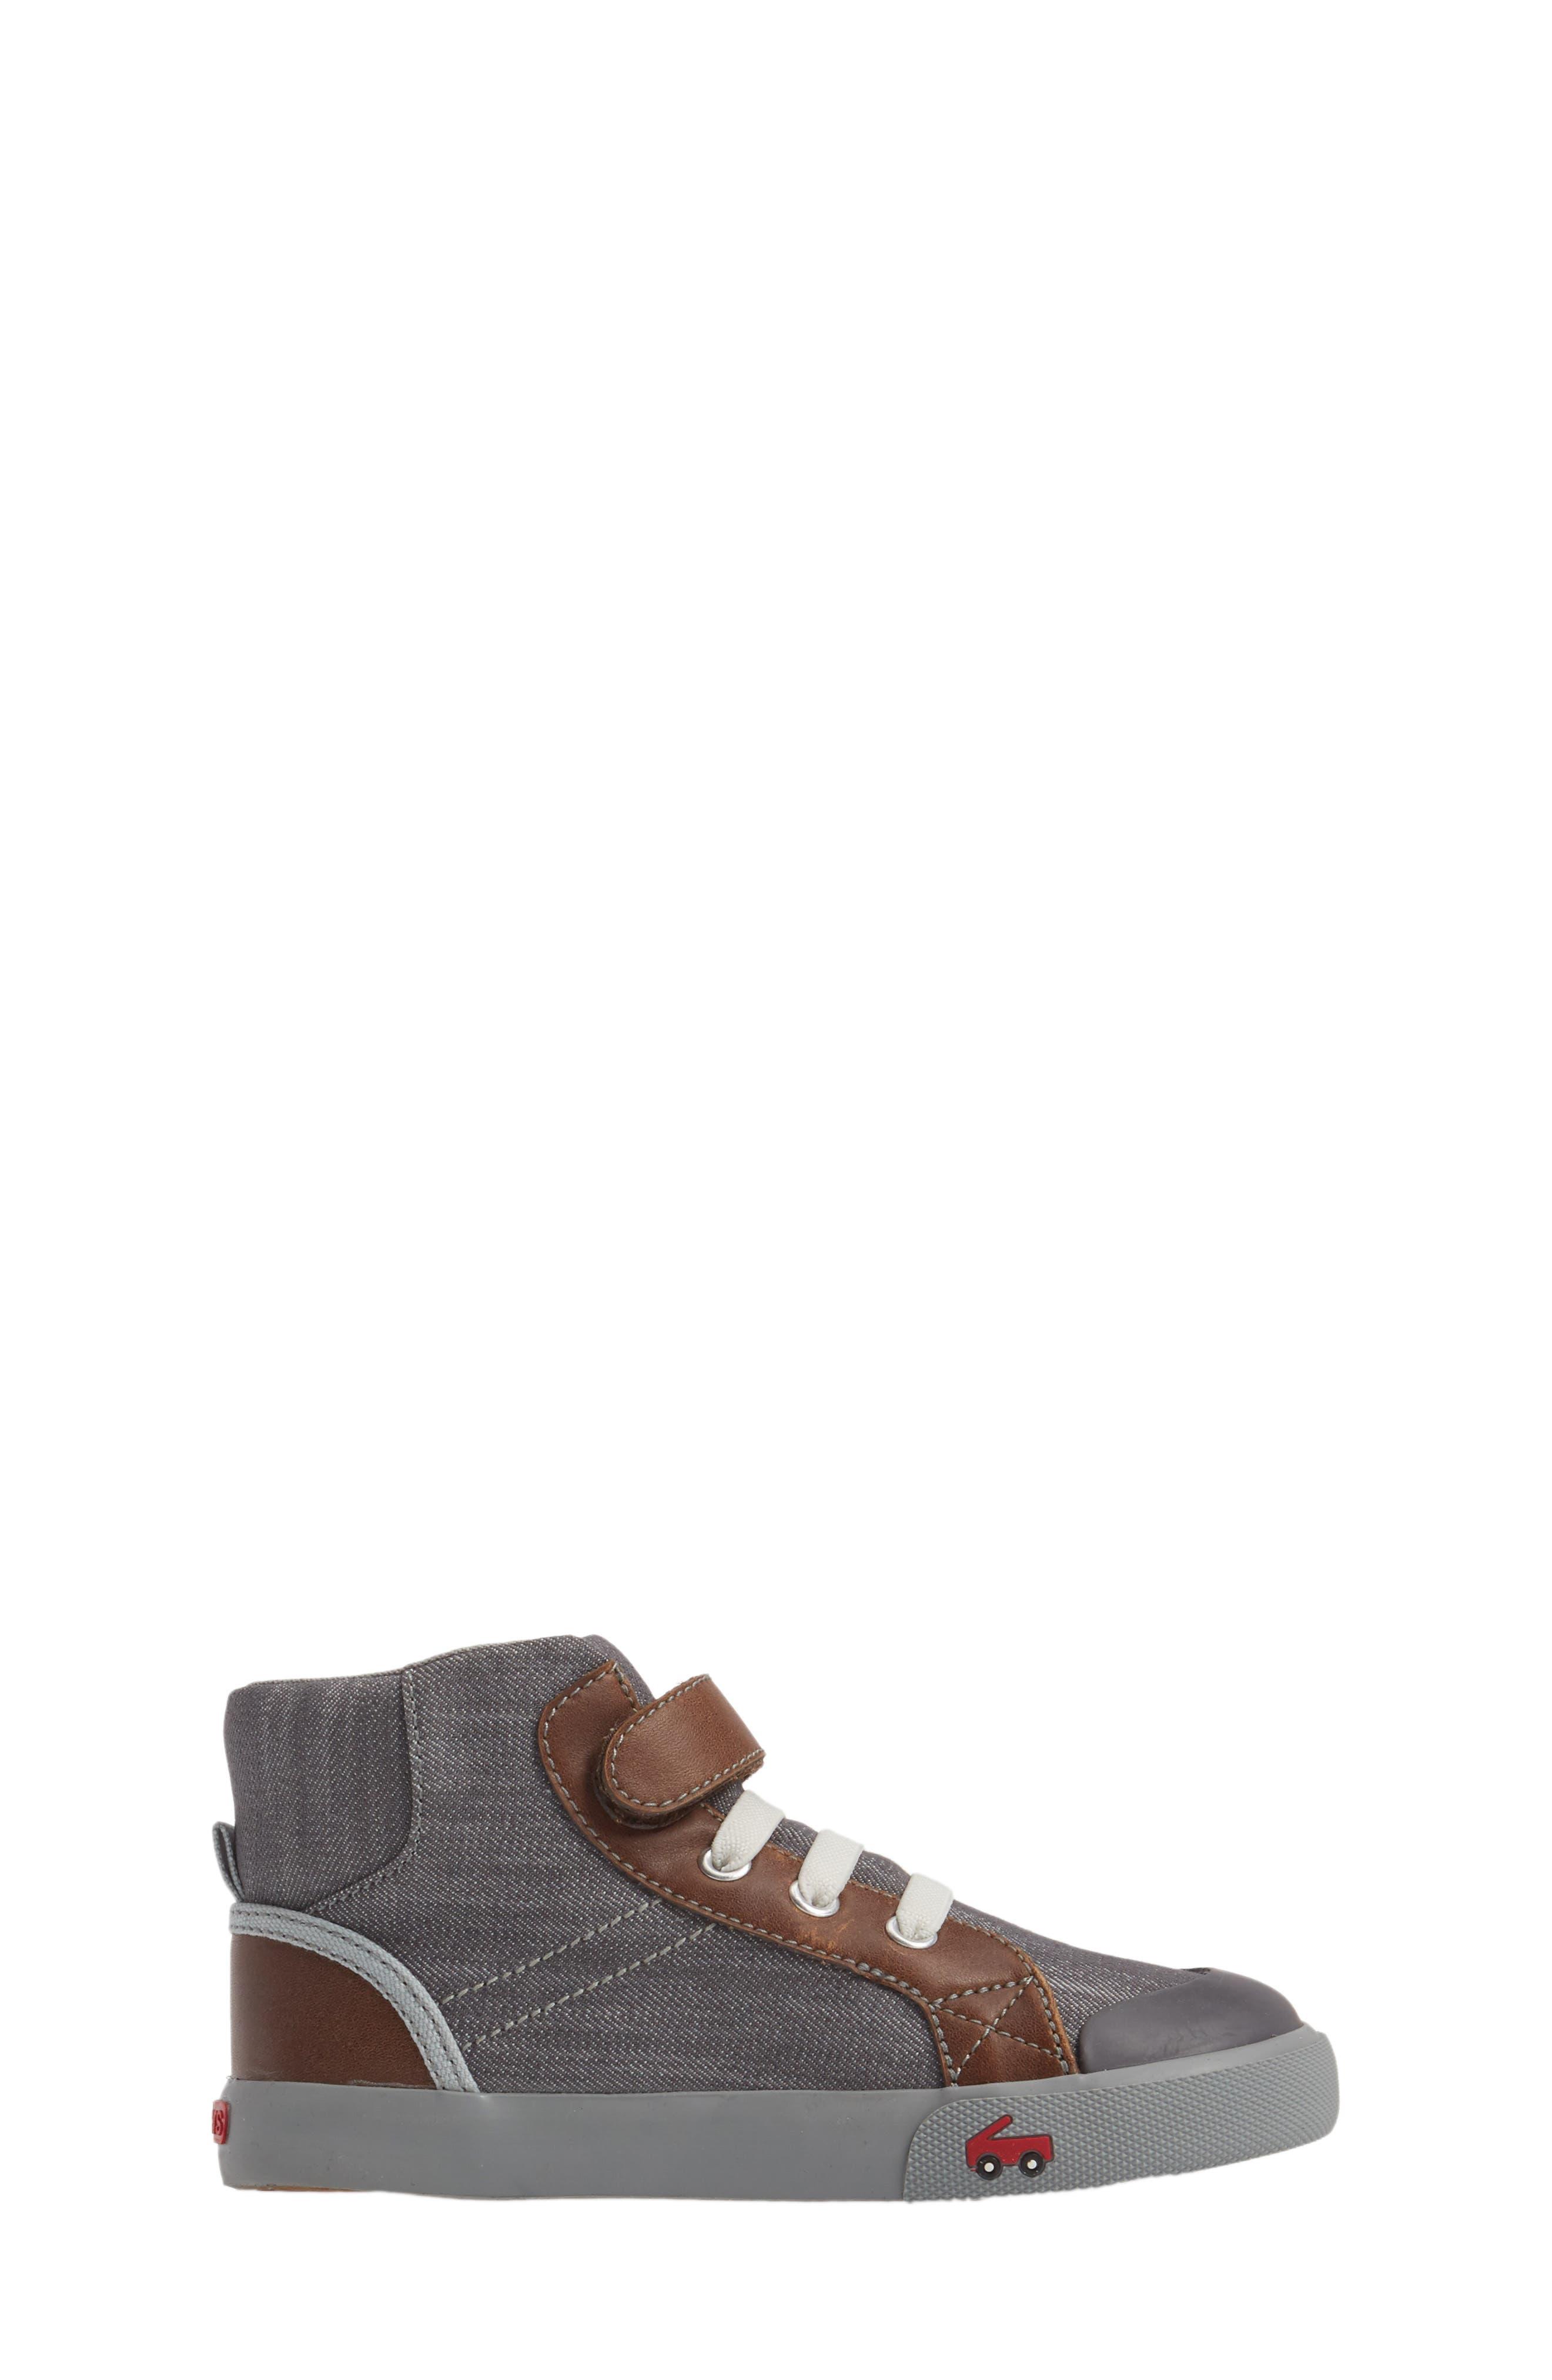 Alternate Image 3  - See Kai Run 'Dane' Sneaker (Baby, Walker & Toddler)